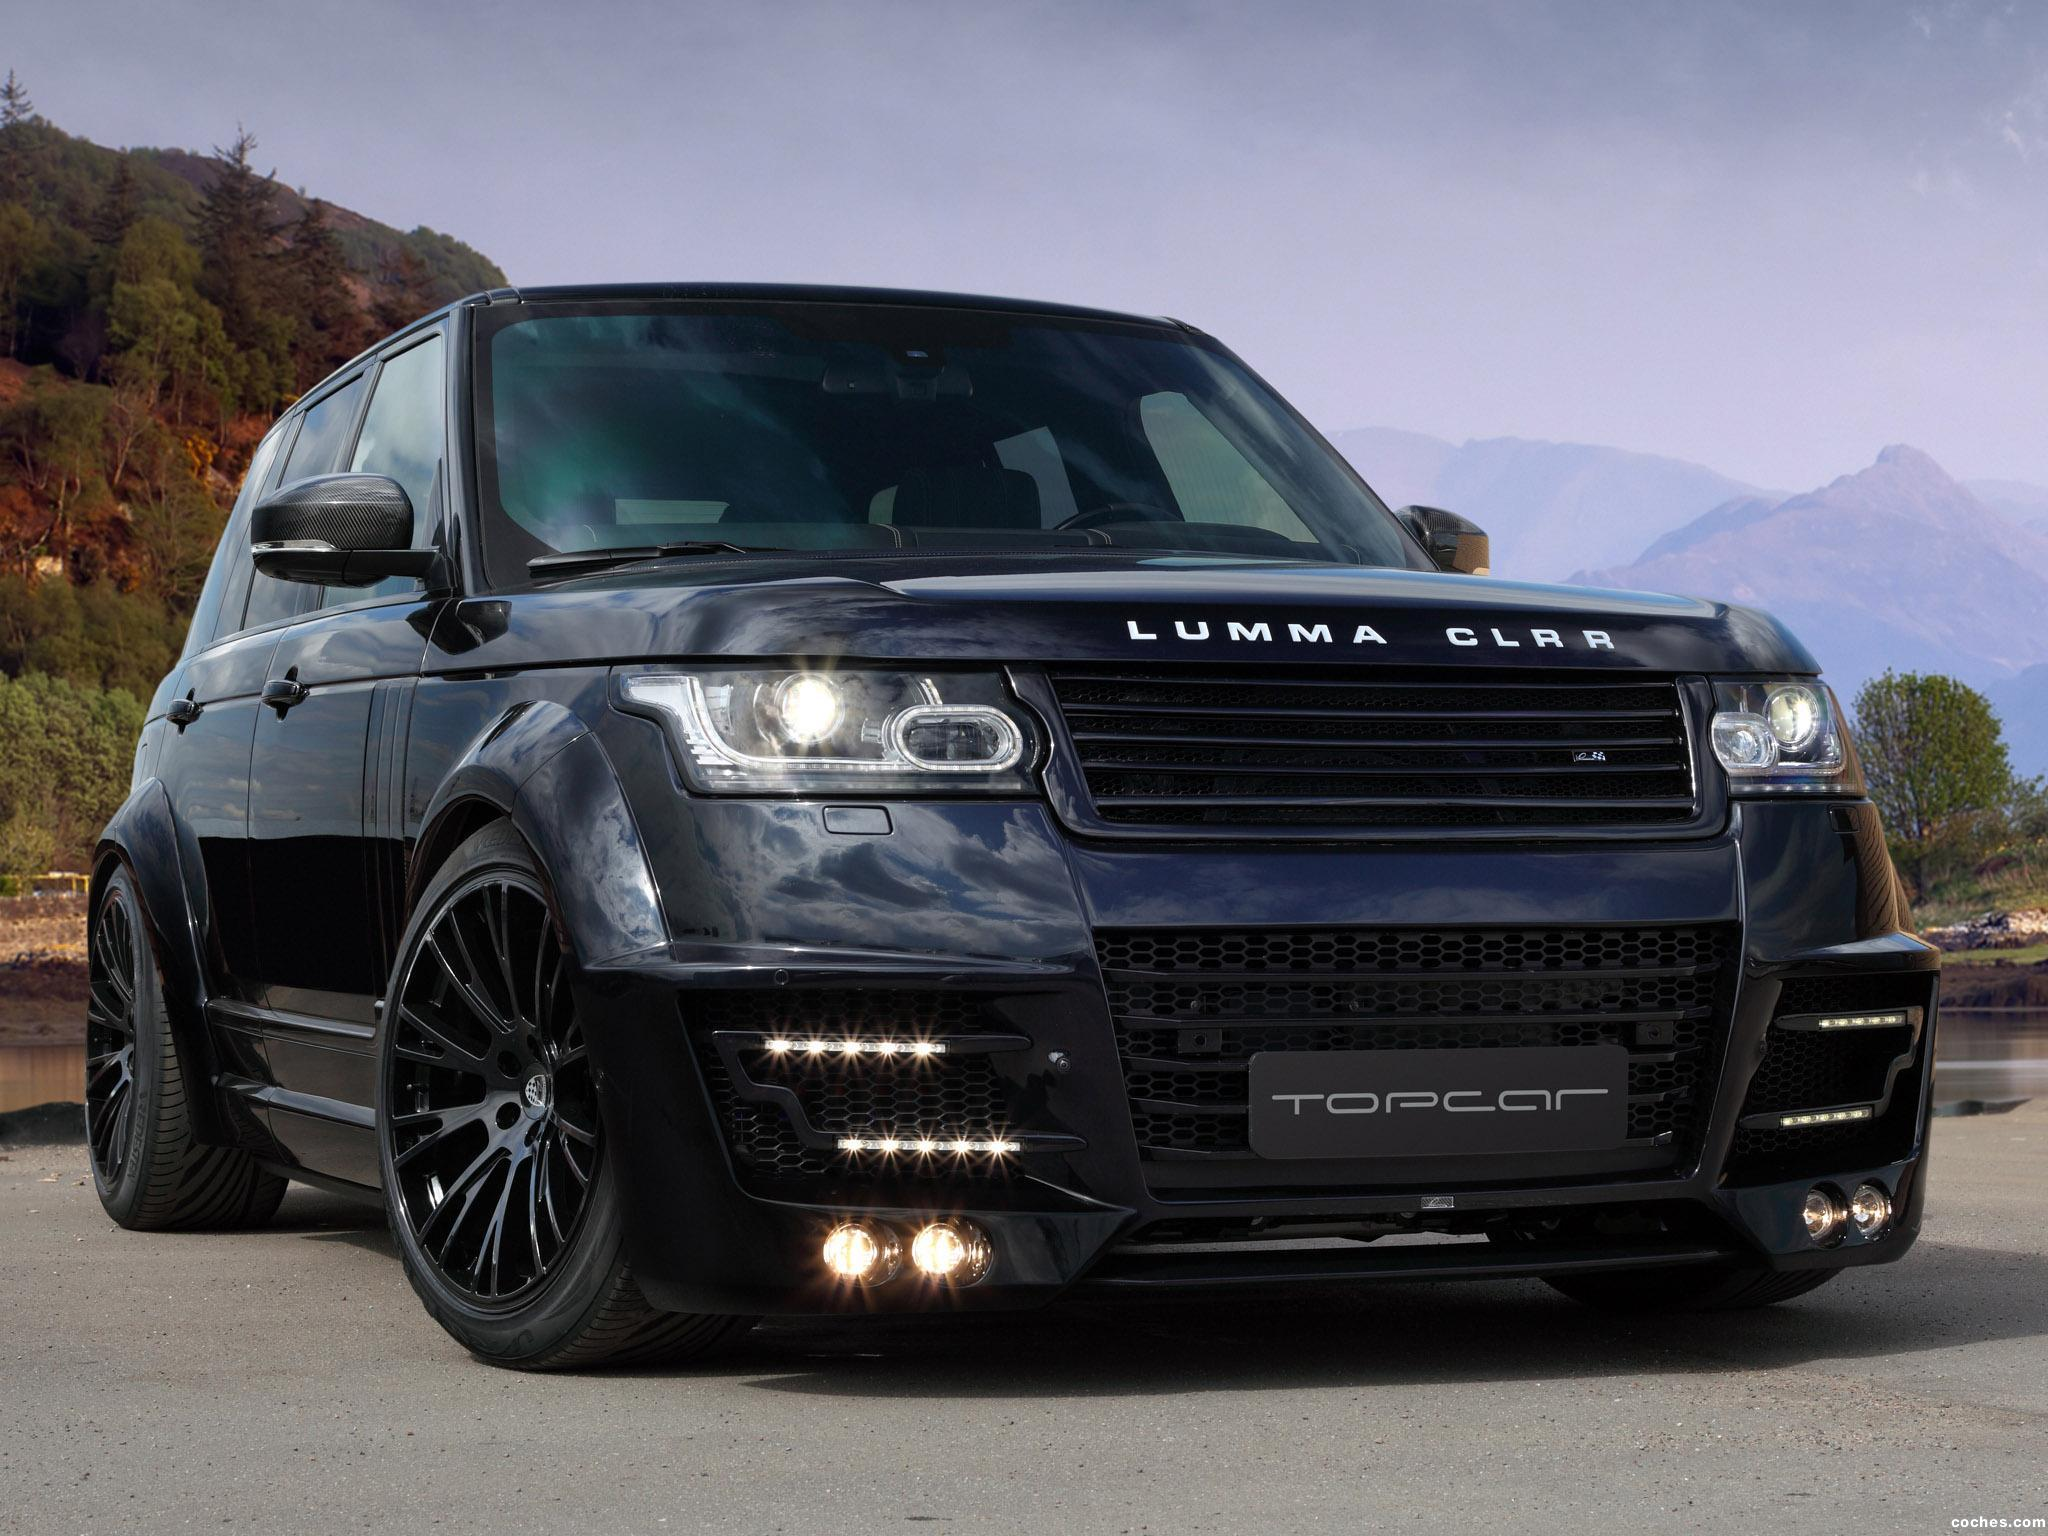 Foto 0 de Topcar Land Rover Range Rover Lumma CLR R L405 2013